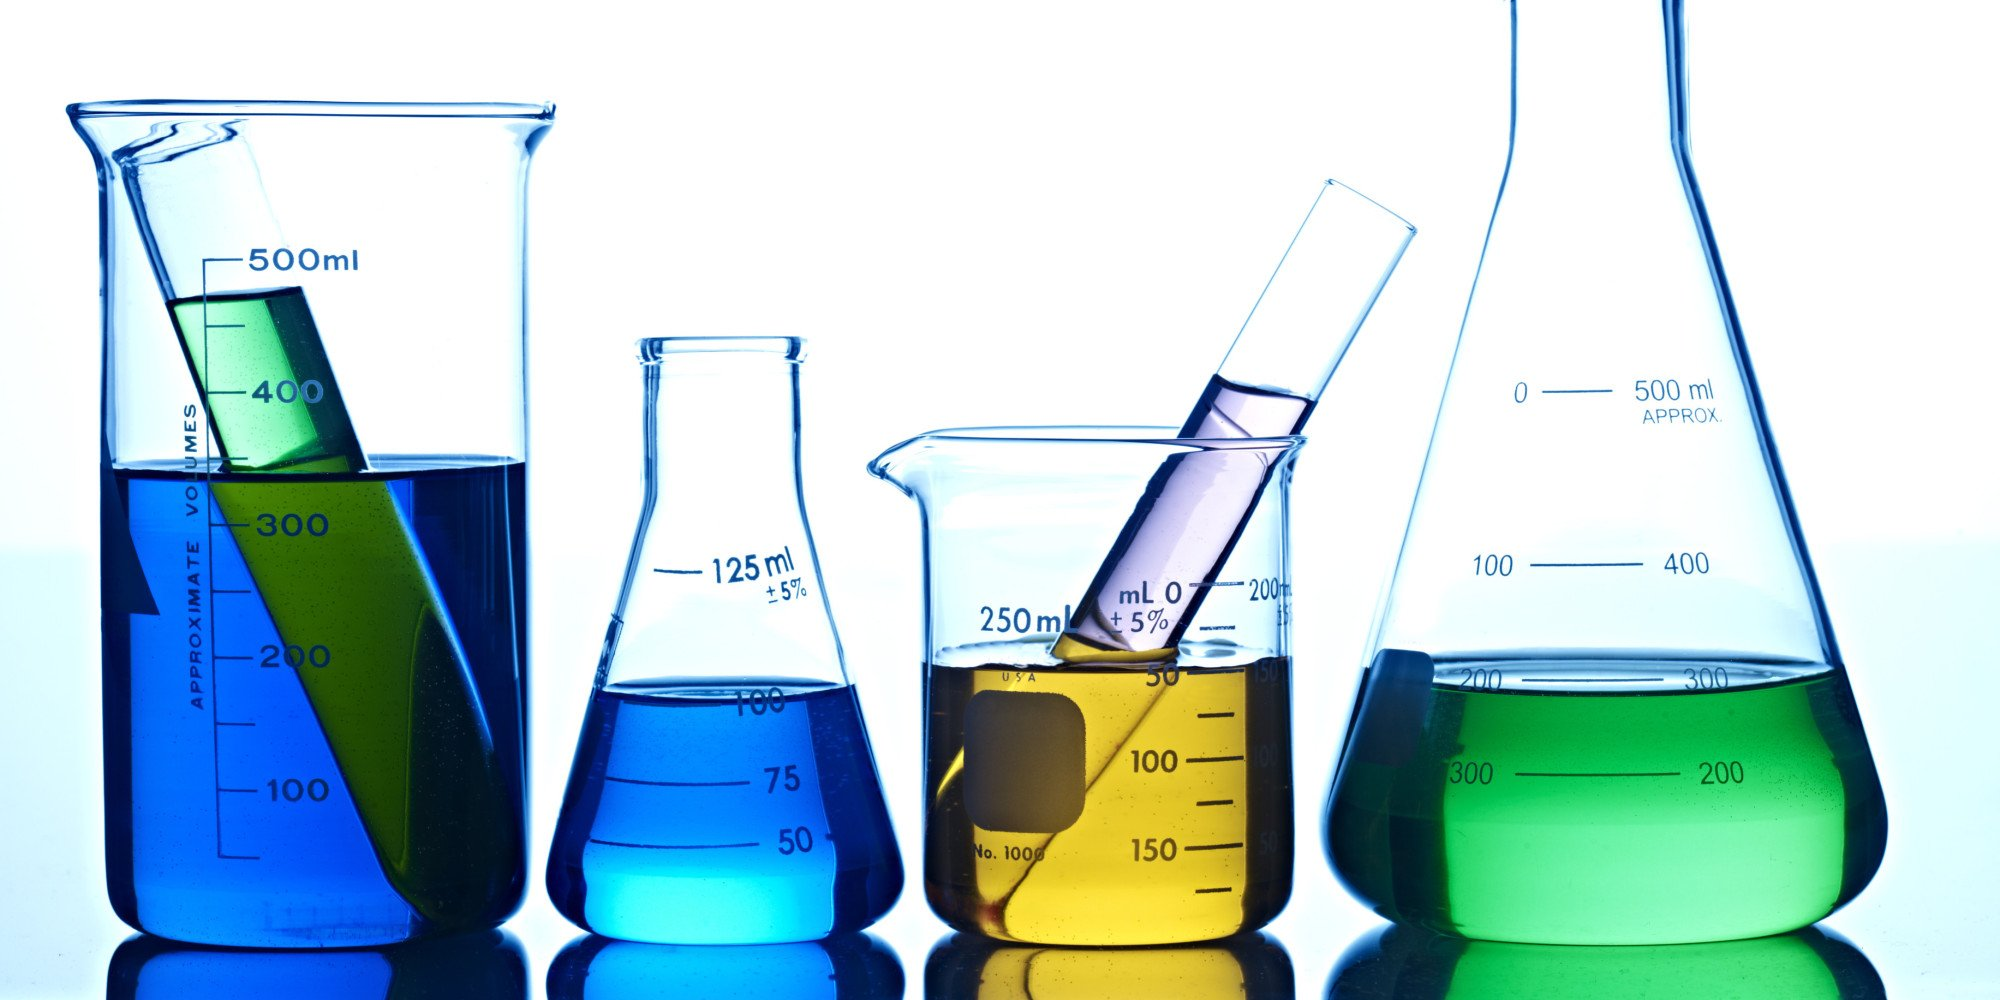 риск рака при действии химии